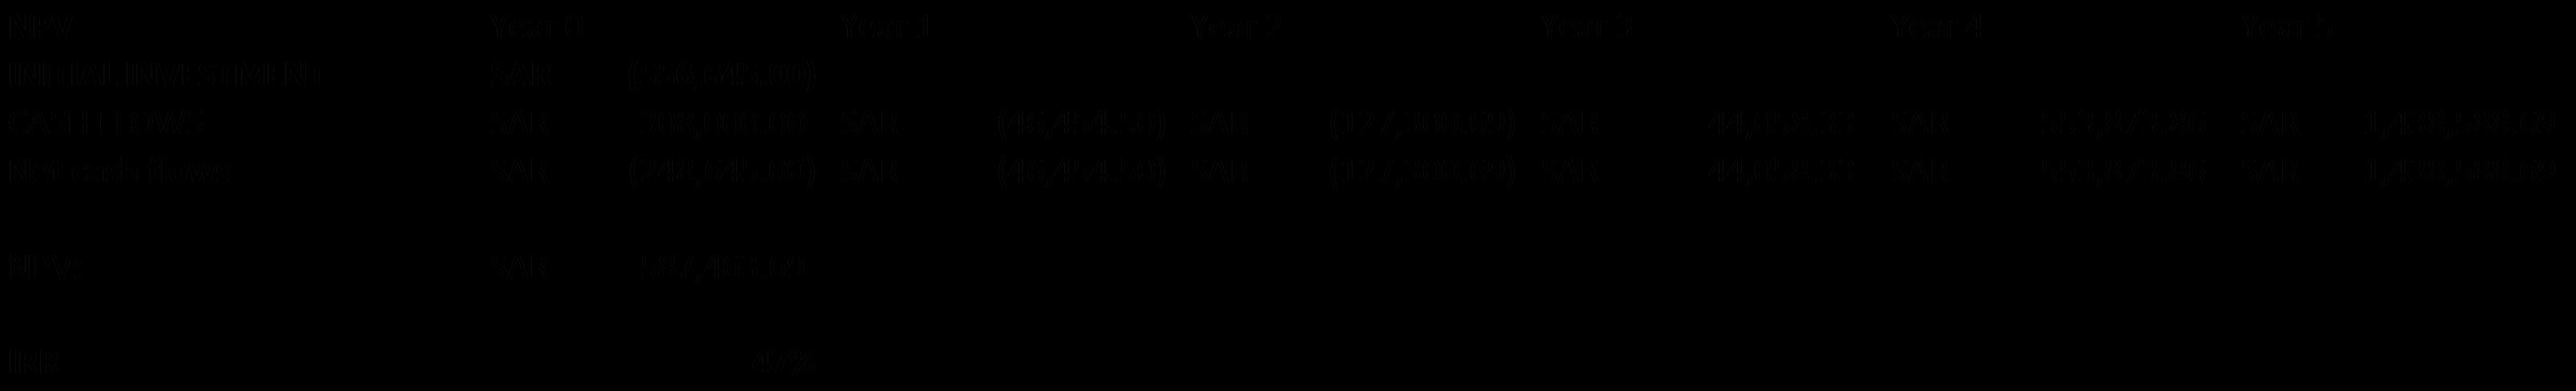 table NPV